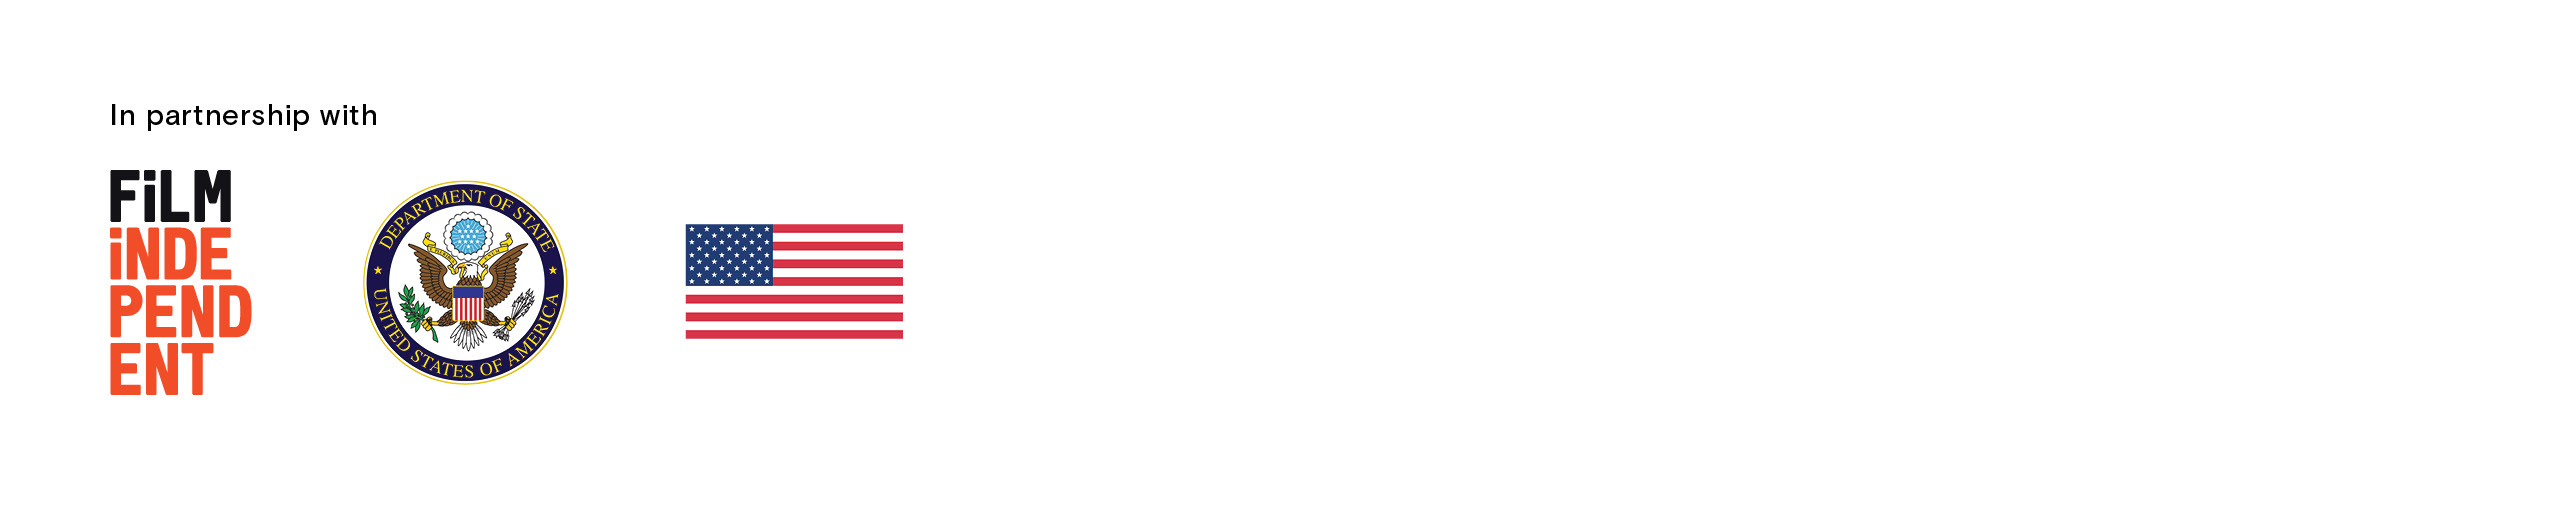 FI_FI-SD_SponsorBar_RGB_Horizontal[1]